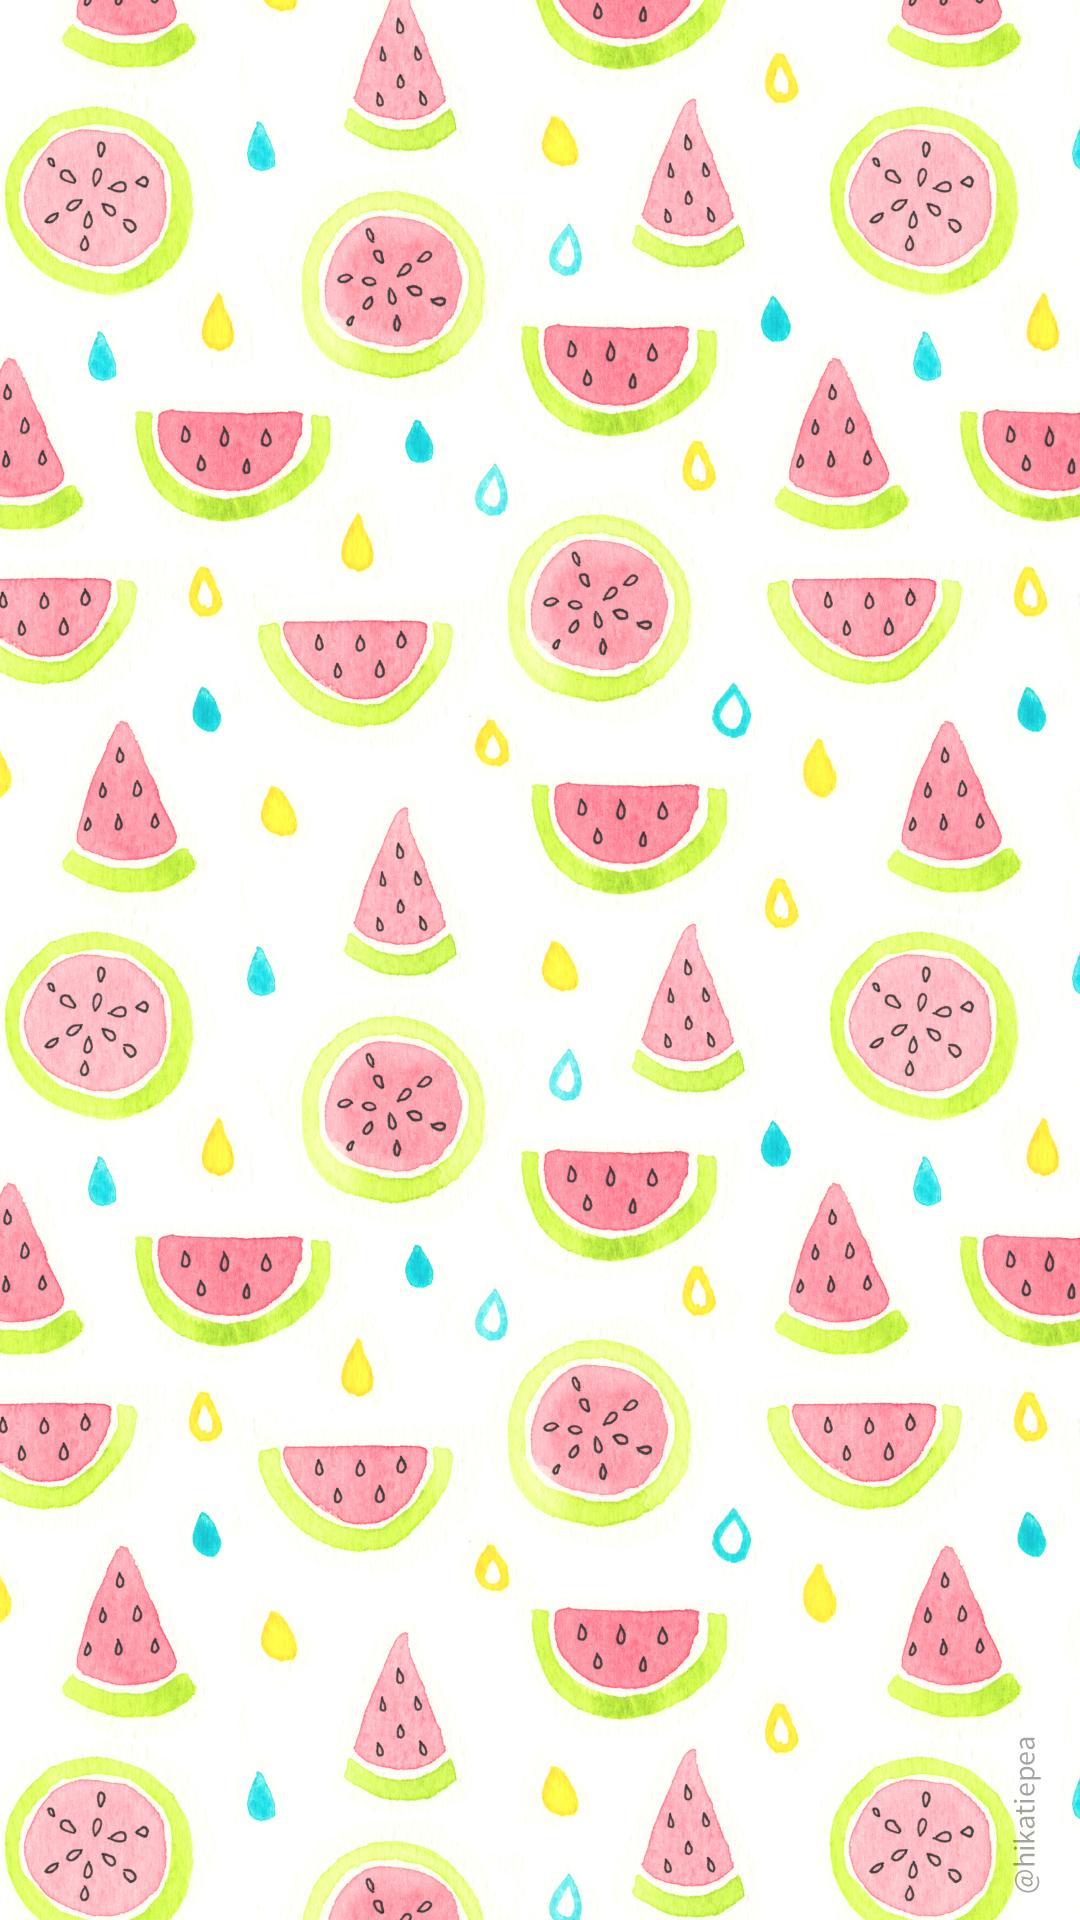 Watermelon Wallpaper � Katie Pea Studio